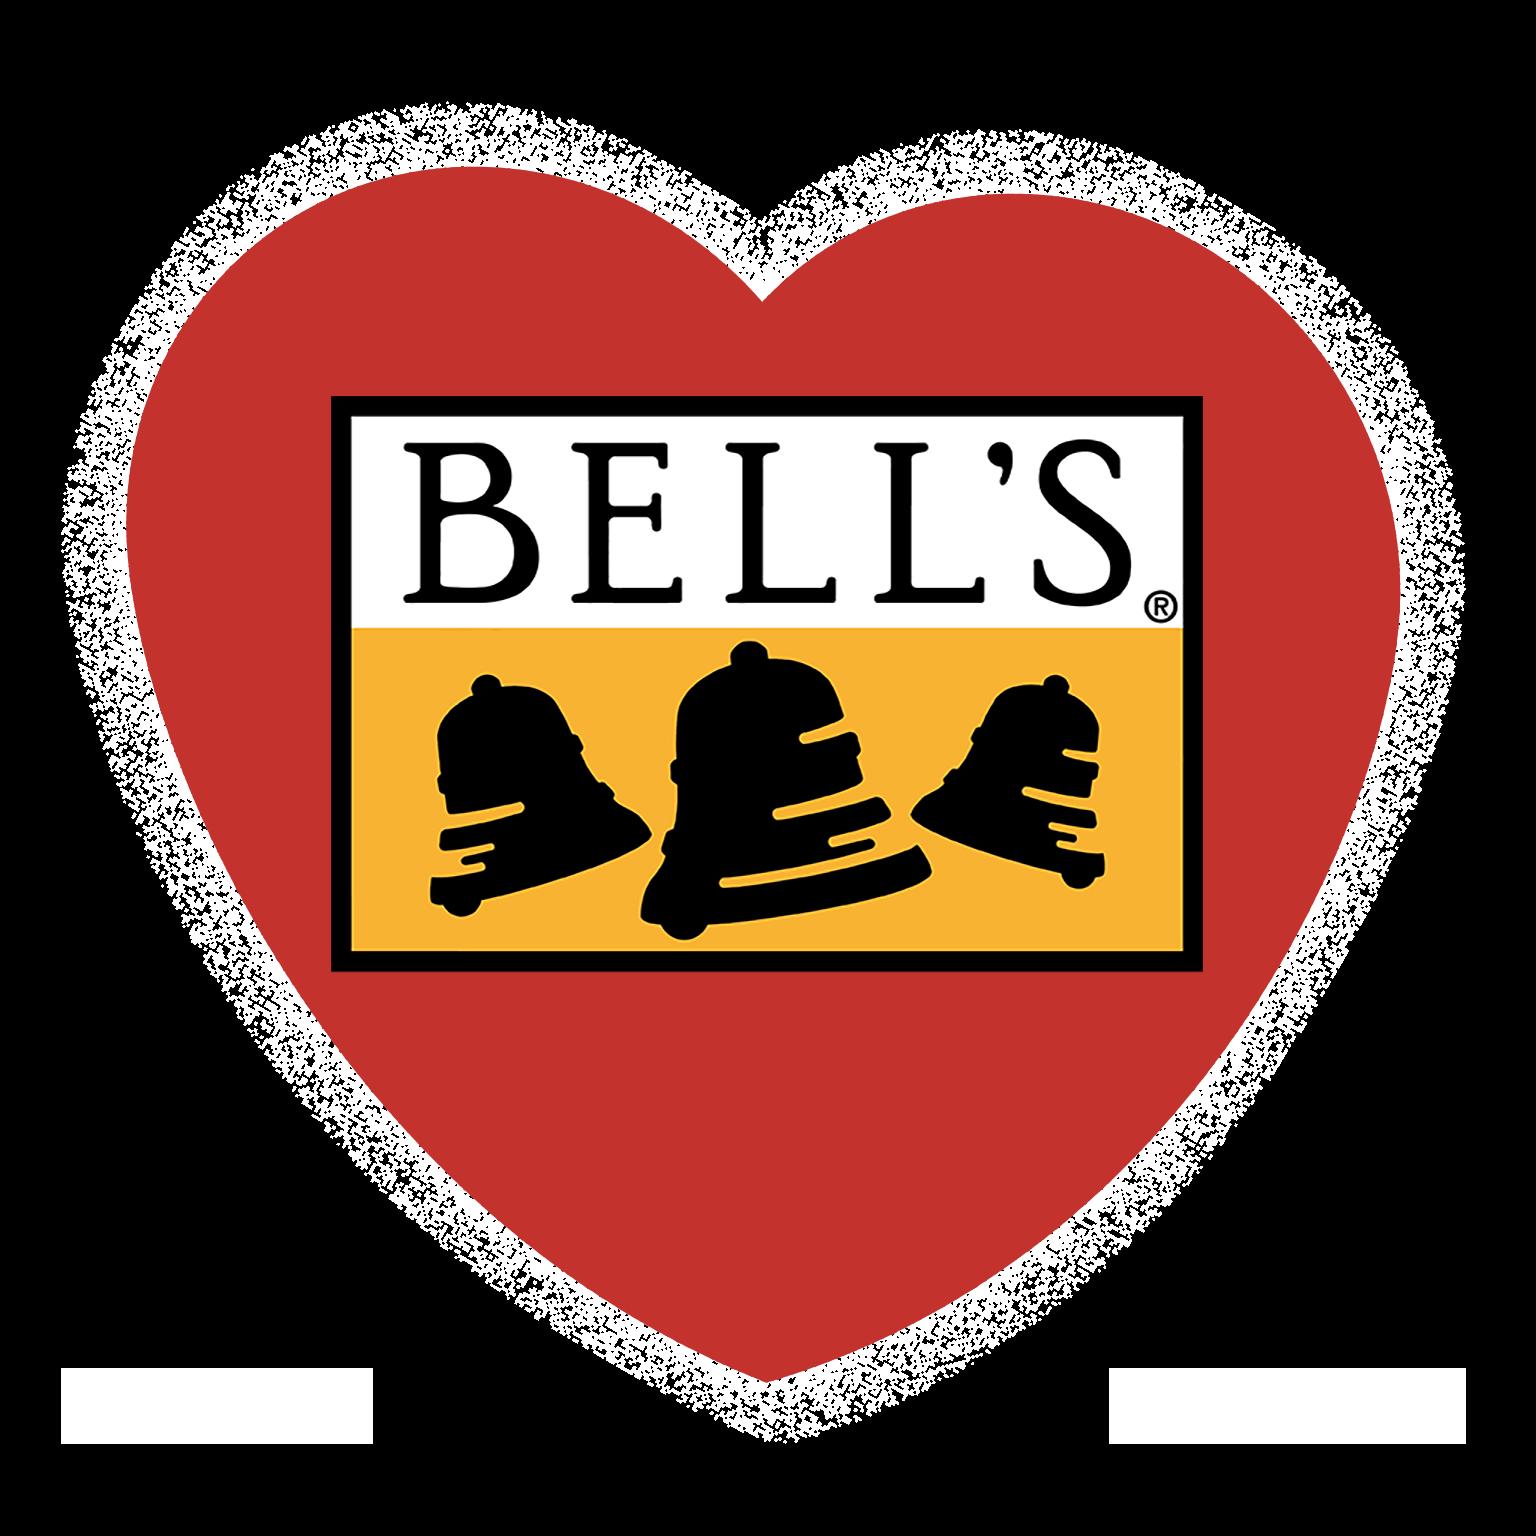 Bell's Beerentines messages sticker-11